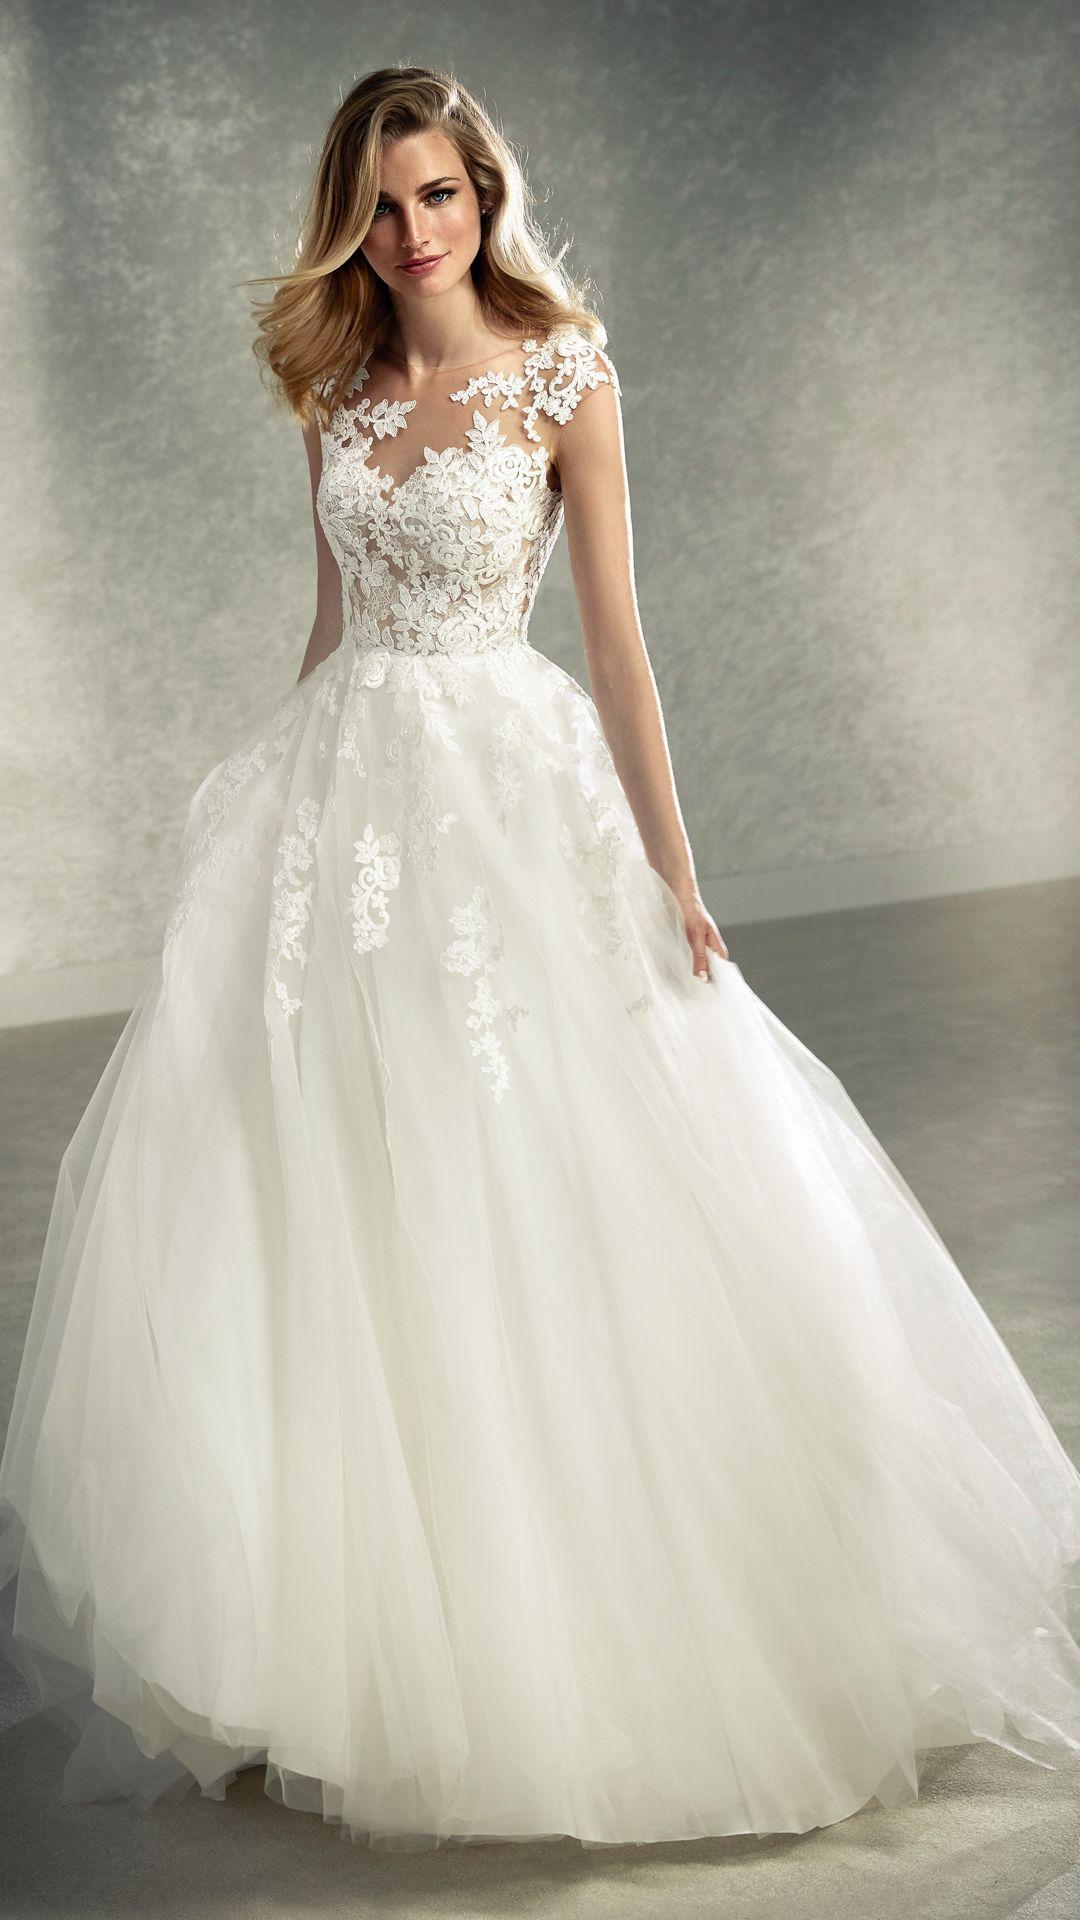 Hochzeitskleider 18 White One Kollektion Modell: FELICIDAD-B-18